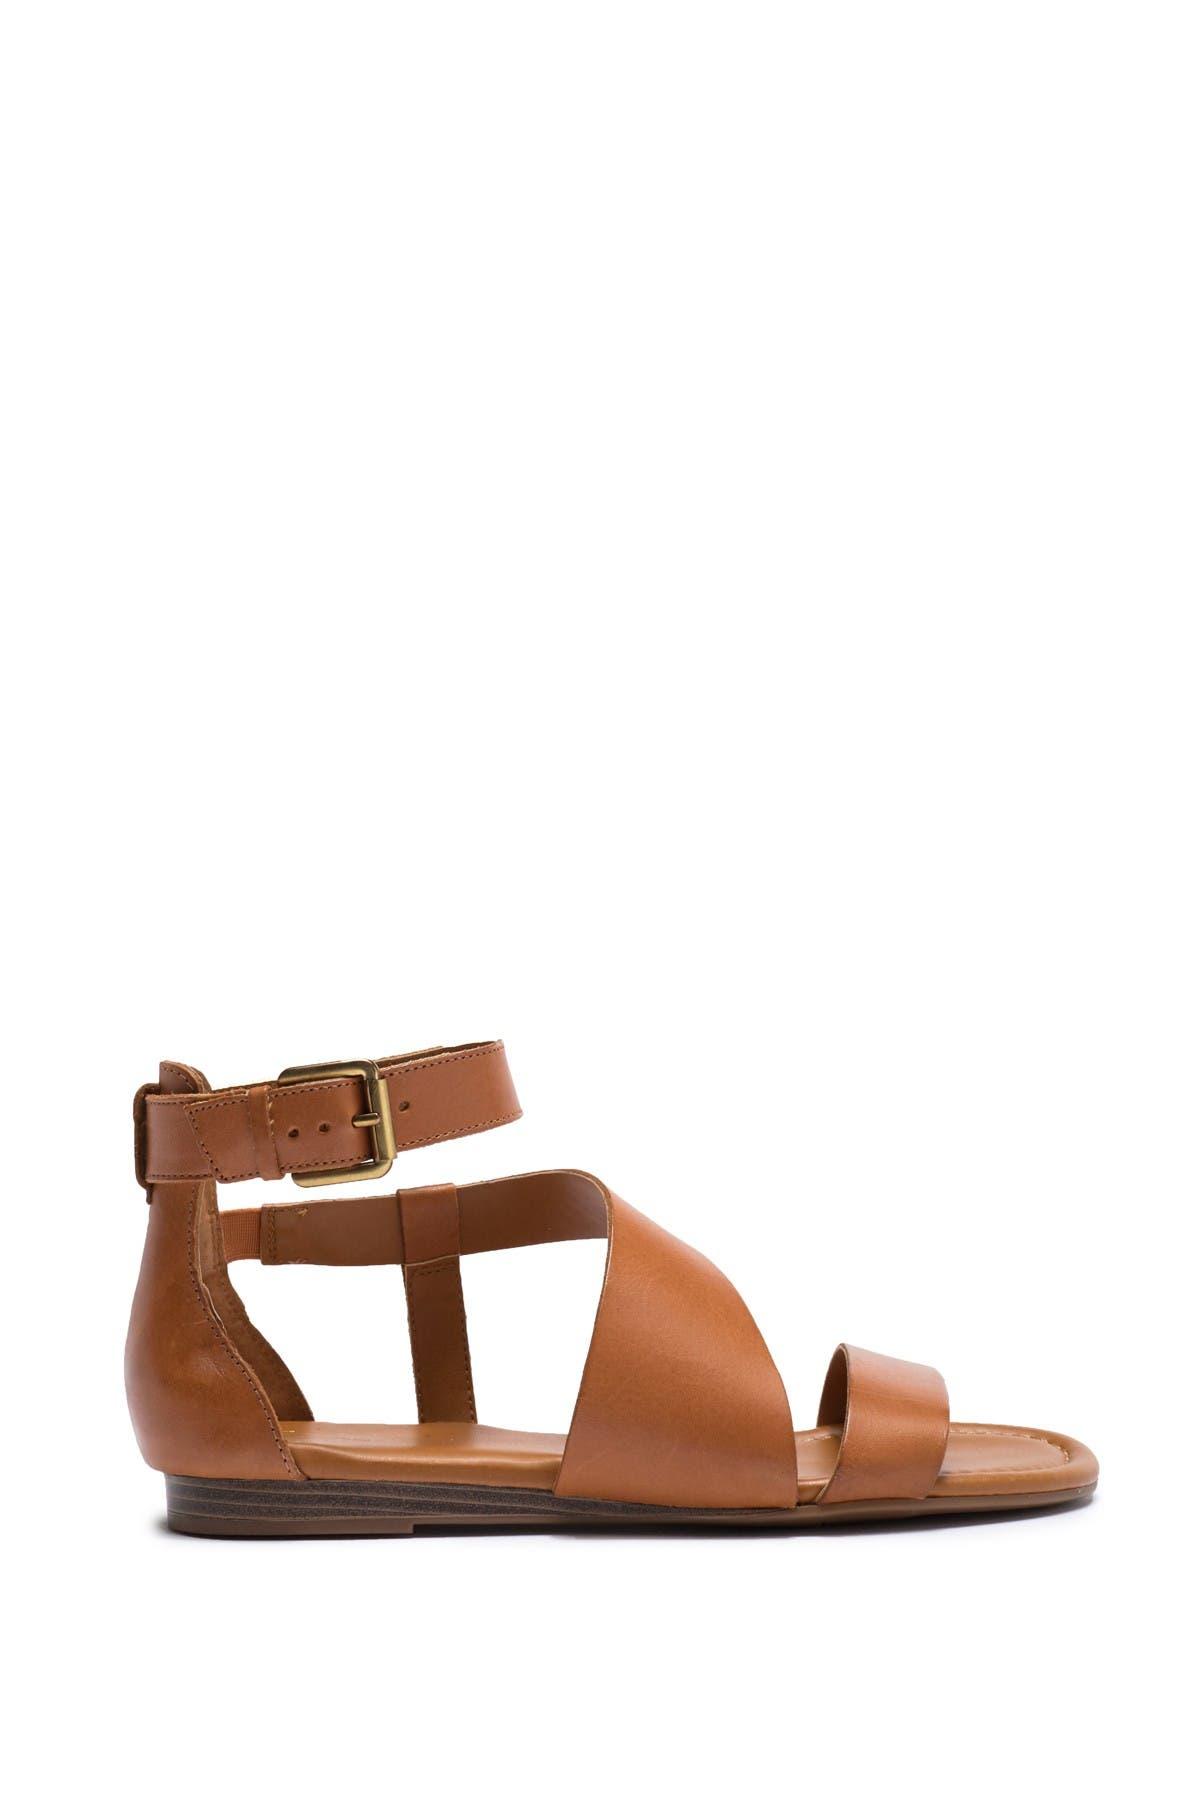 Image of Franco Sarto Griffith Leather Sandal